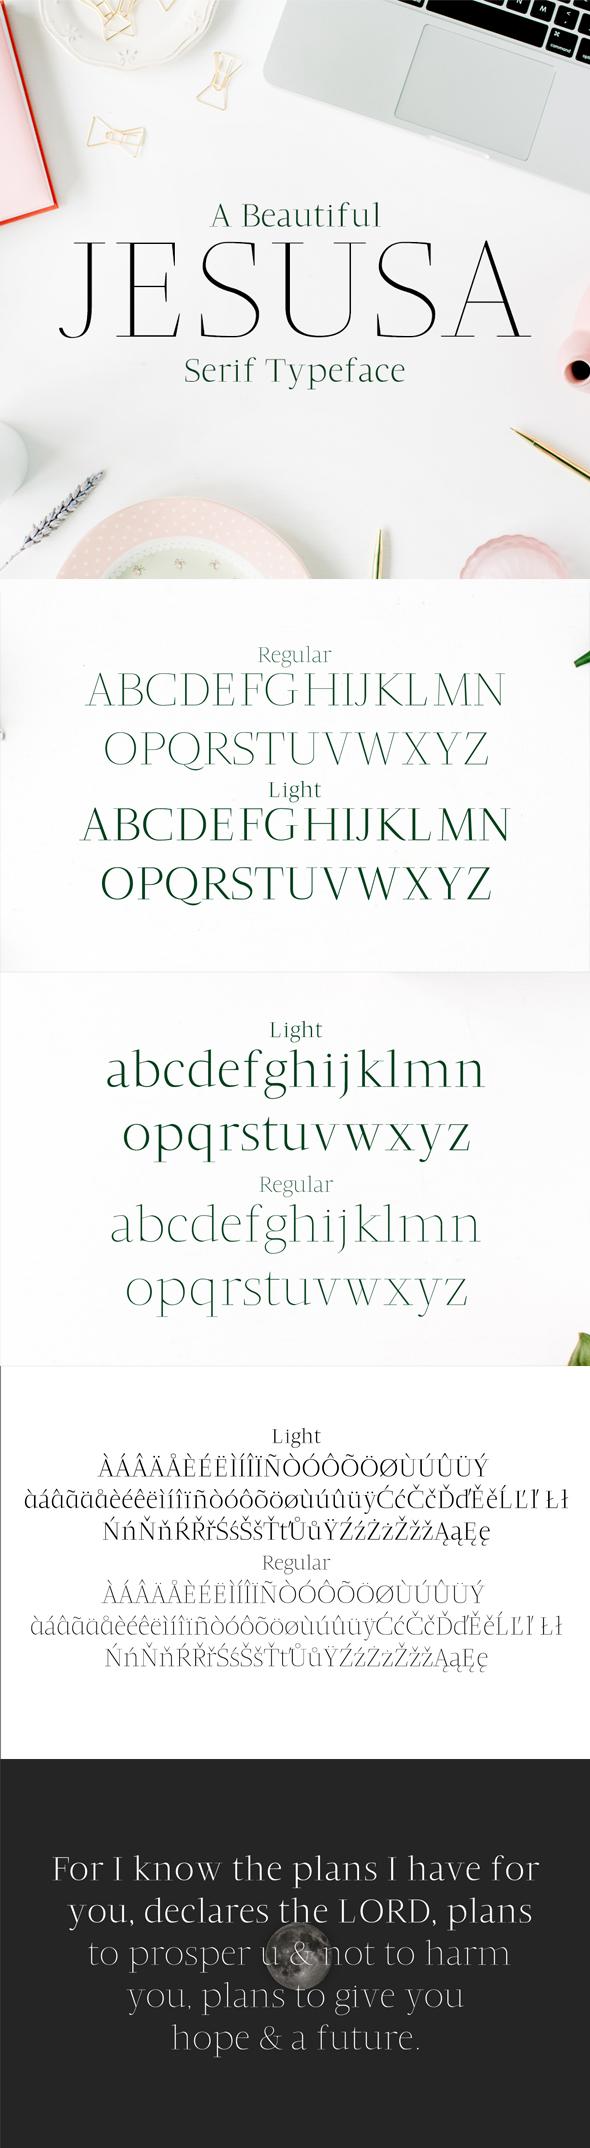 GraphicRiver Jesusa Serif Typeface 20520811